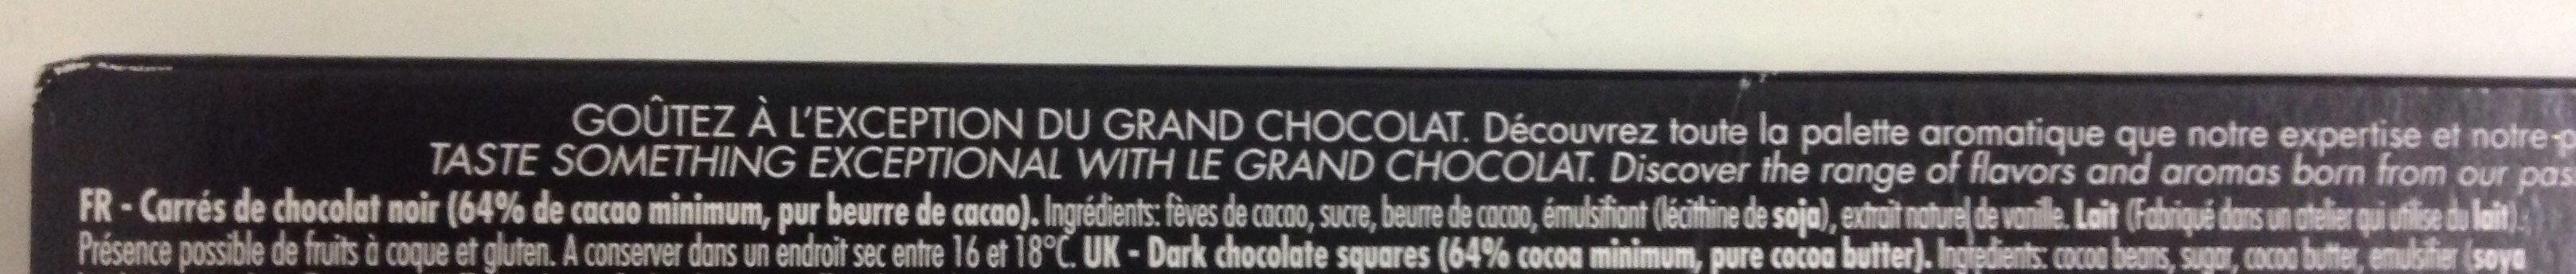 Initiation grands crus - Ingrediënten